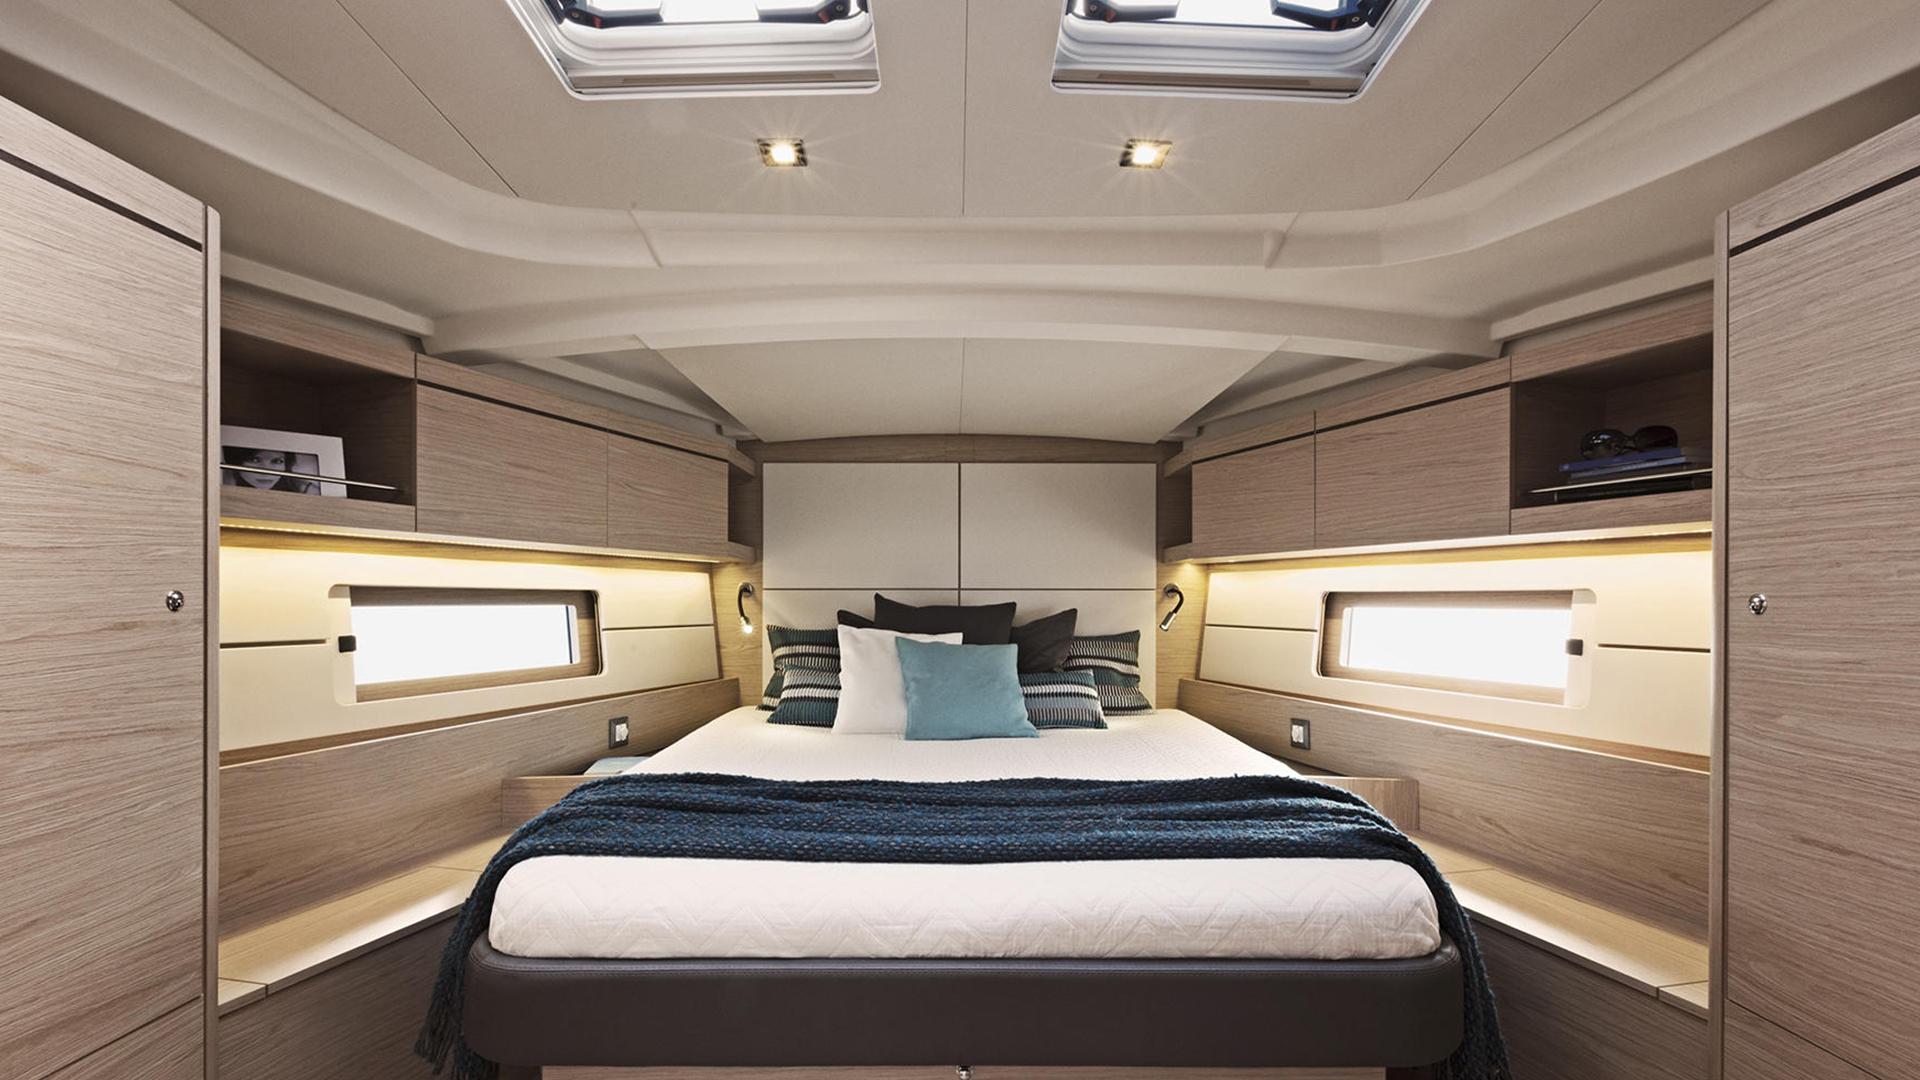 Oceanis 46.1 Master bedroom